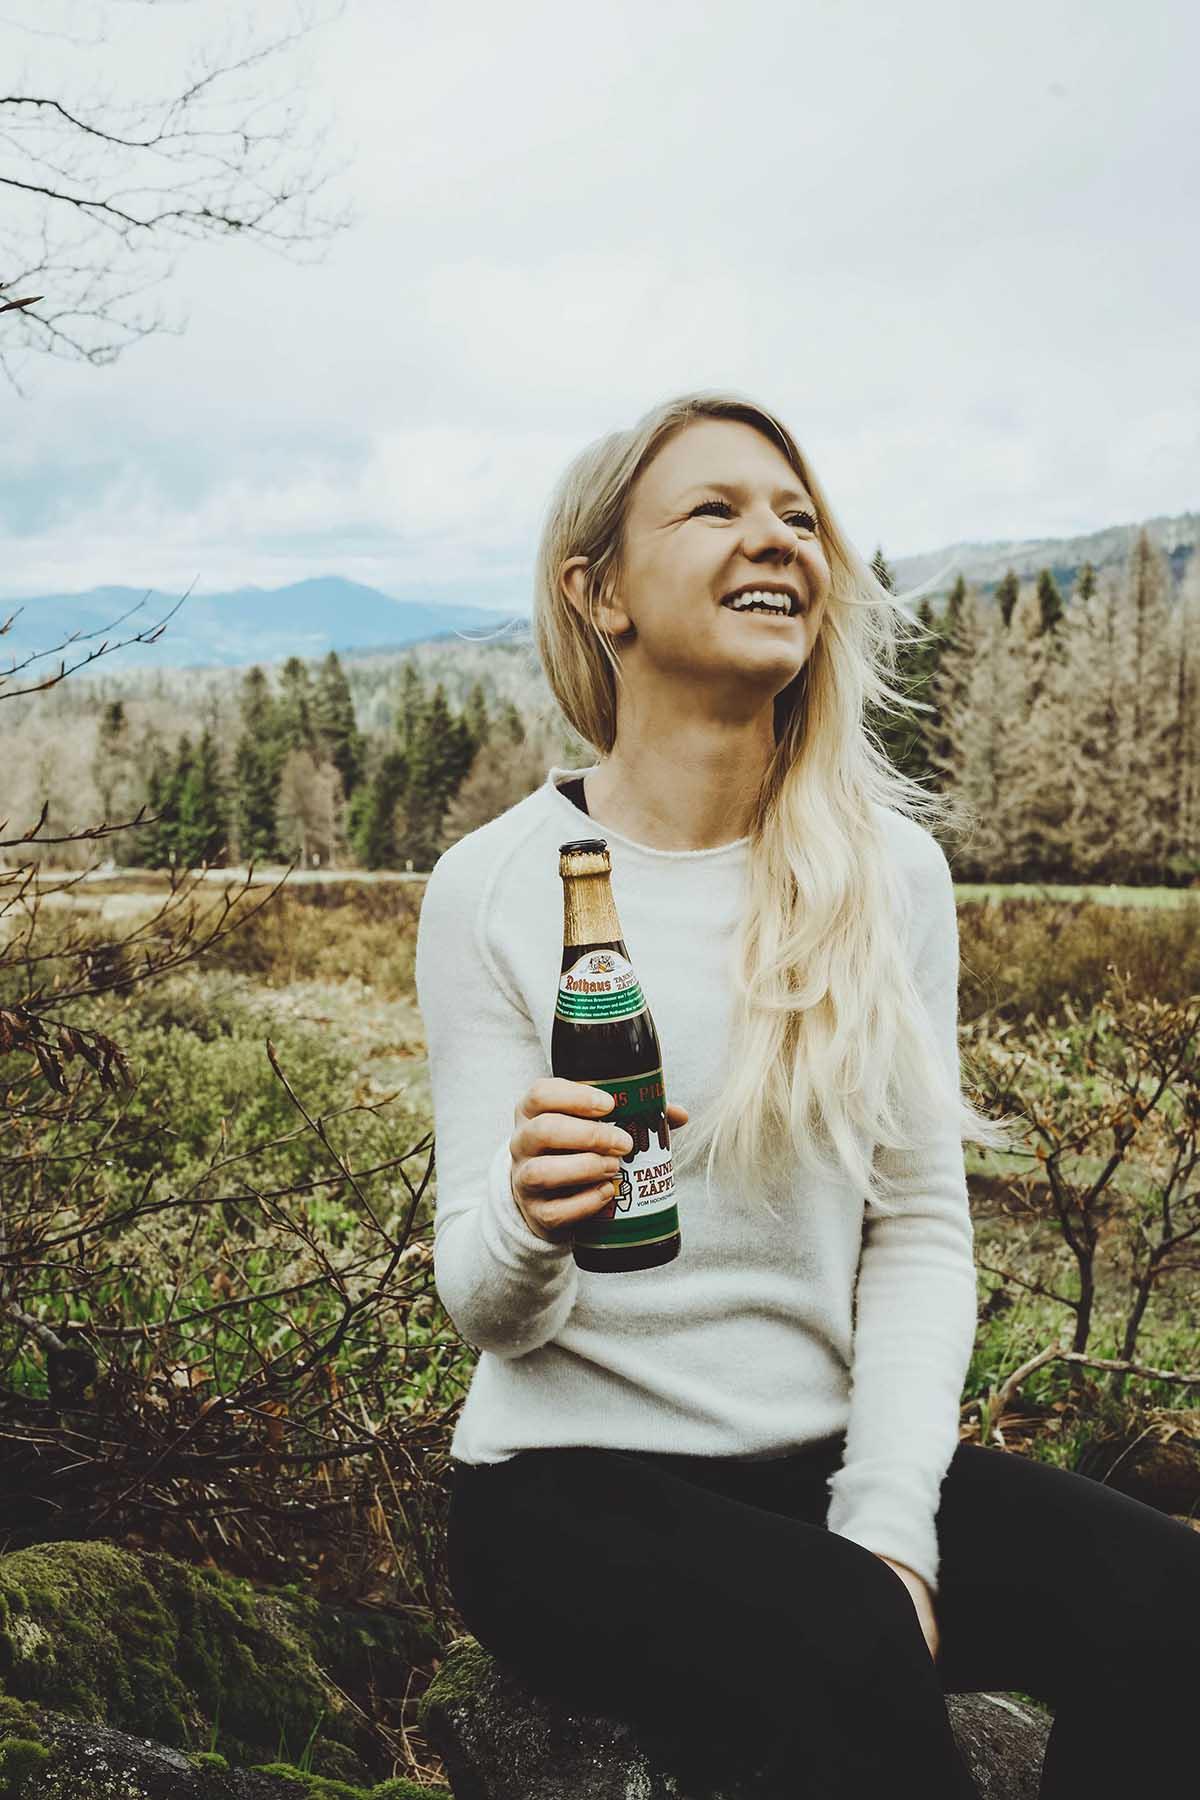 schachtenwanderung-frau-bier